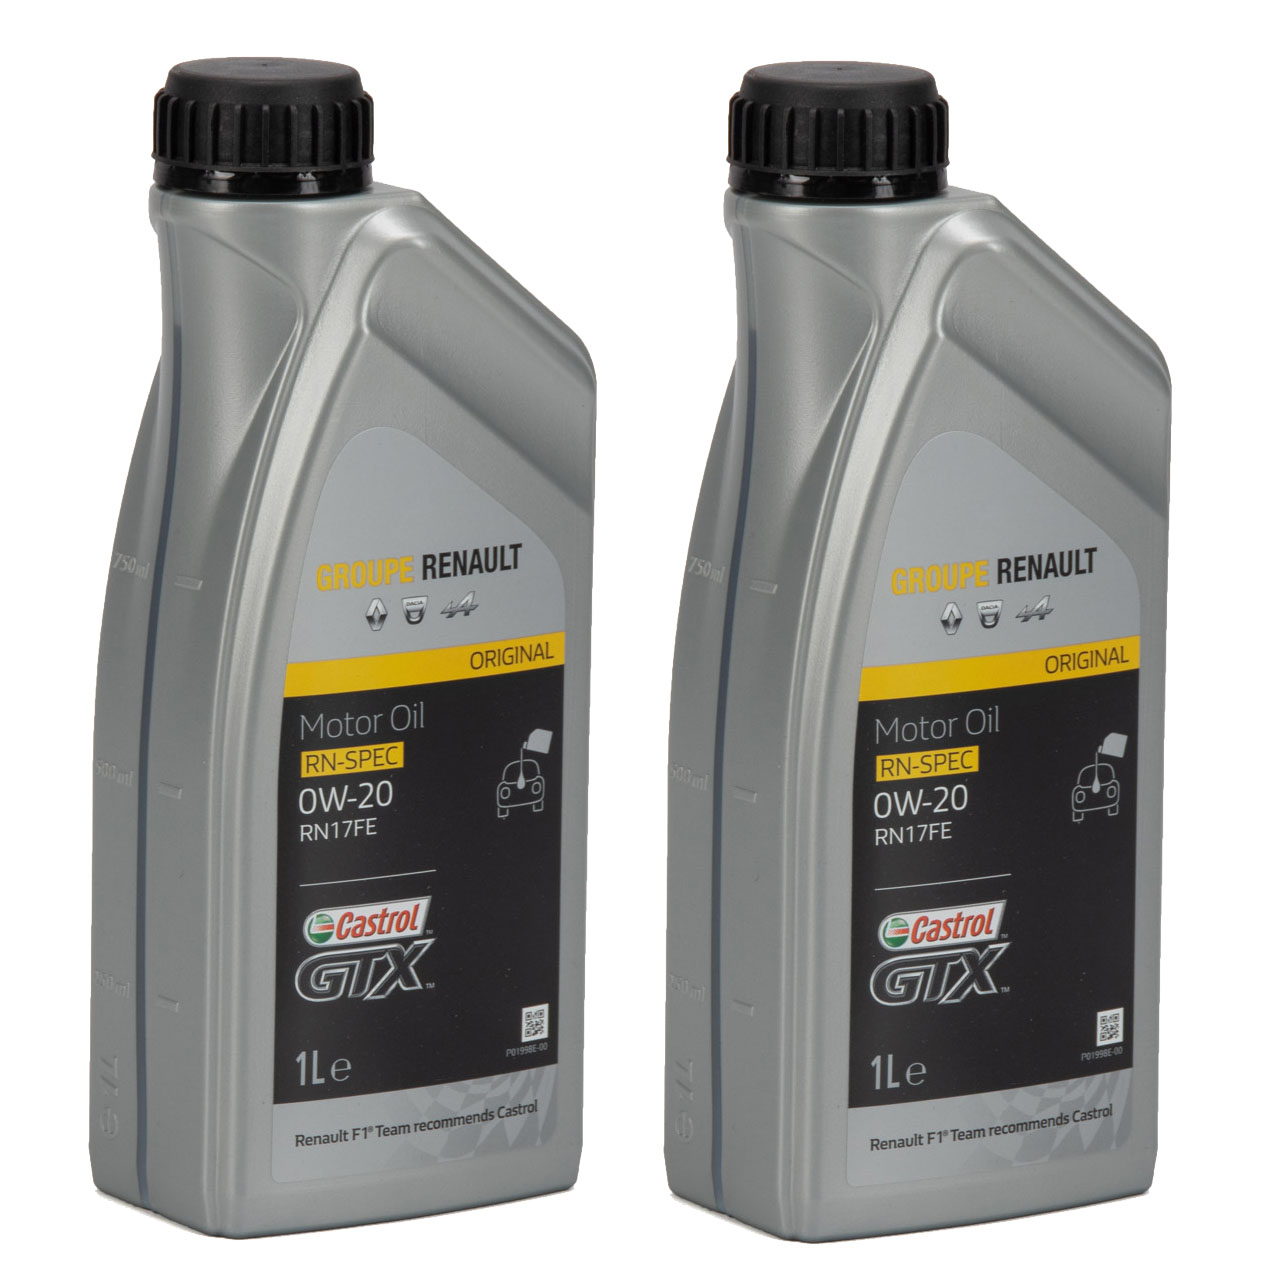 CASTROL Motoröl Öl GTX RN-SPEC 0W-20 0W20 für Renault RN17FE - 2L 2 Liter